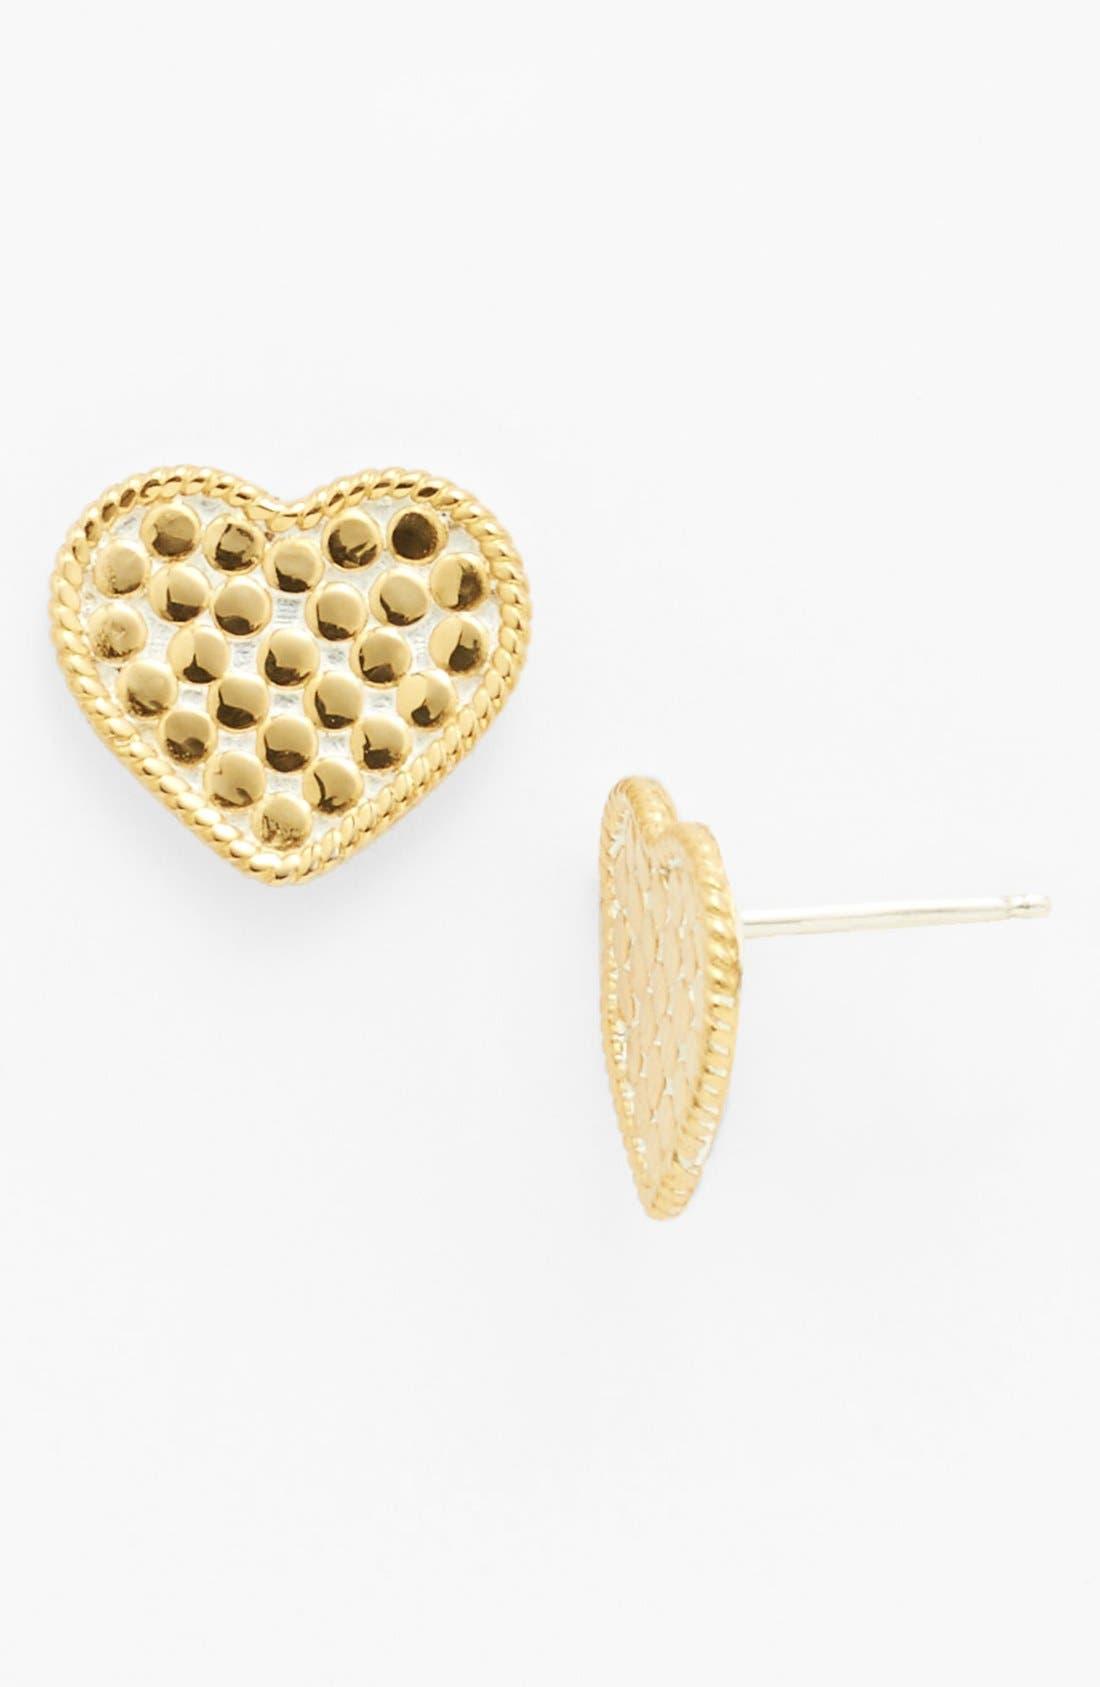 Alternate Image 1 Selected - Anna Beck 'Gili' Heart Stud Earrings